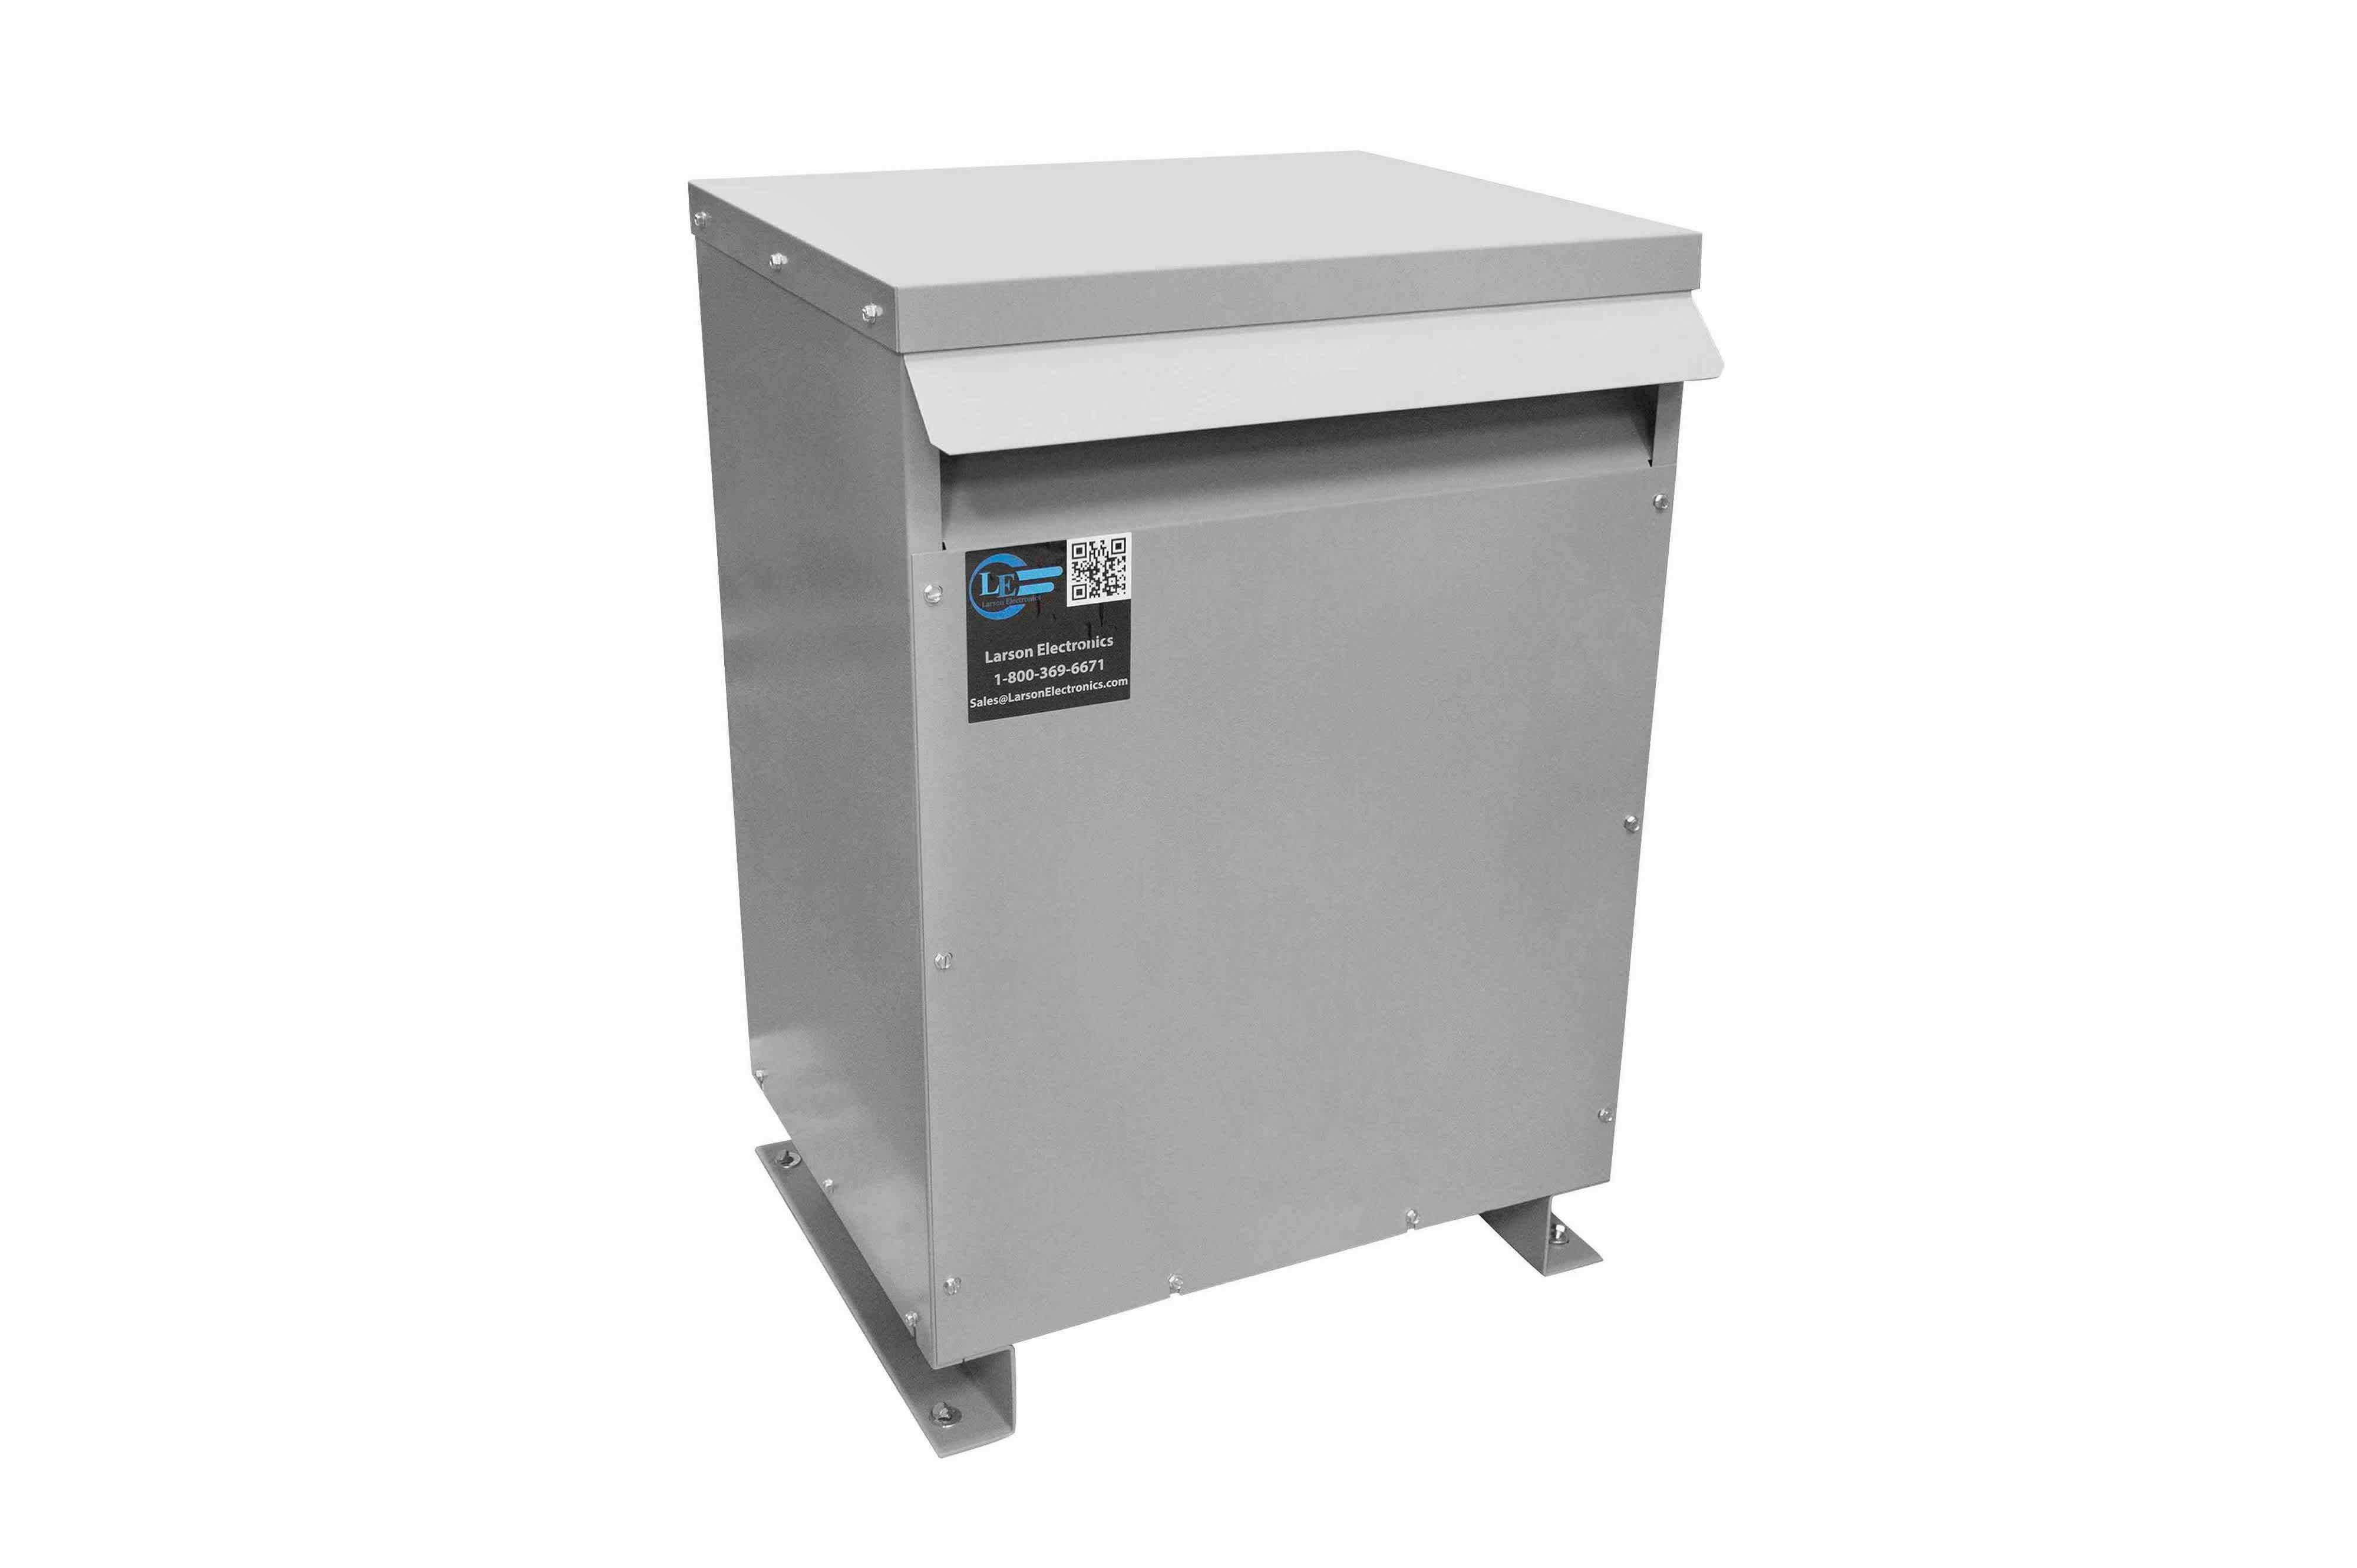 12 kVA 3PH Isolation Transformer, 575V Wye Primary, 480Y/277 Wye-N Secondary, N3R, Ventilated, 60 Hz